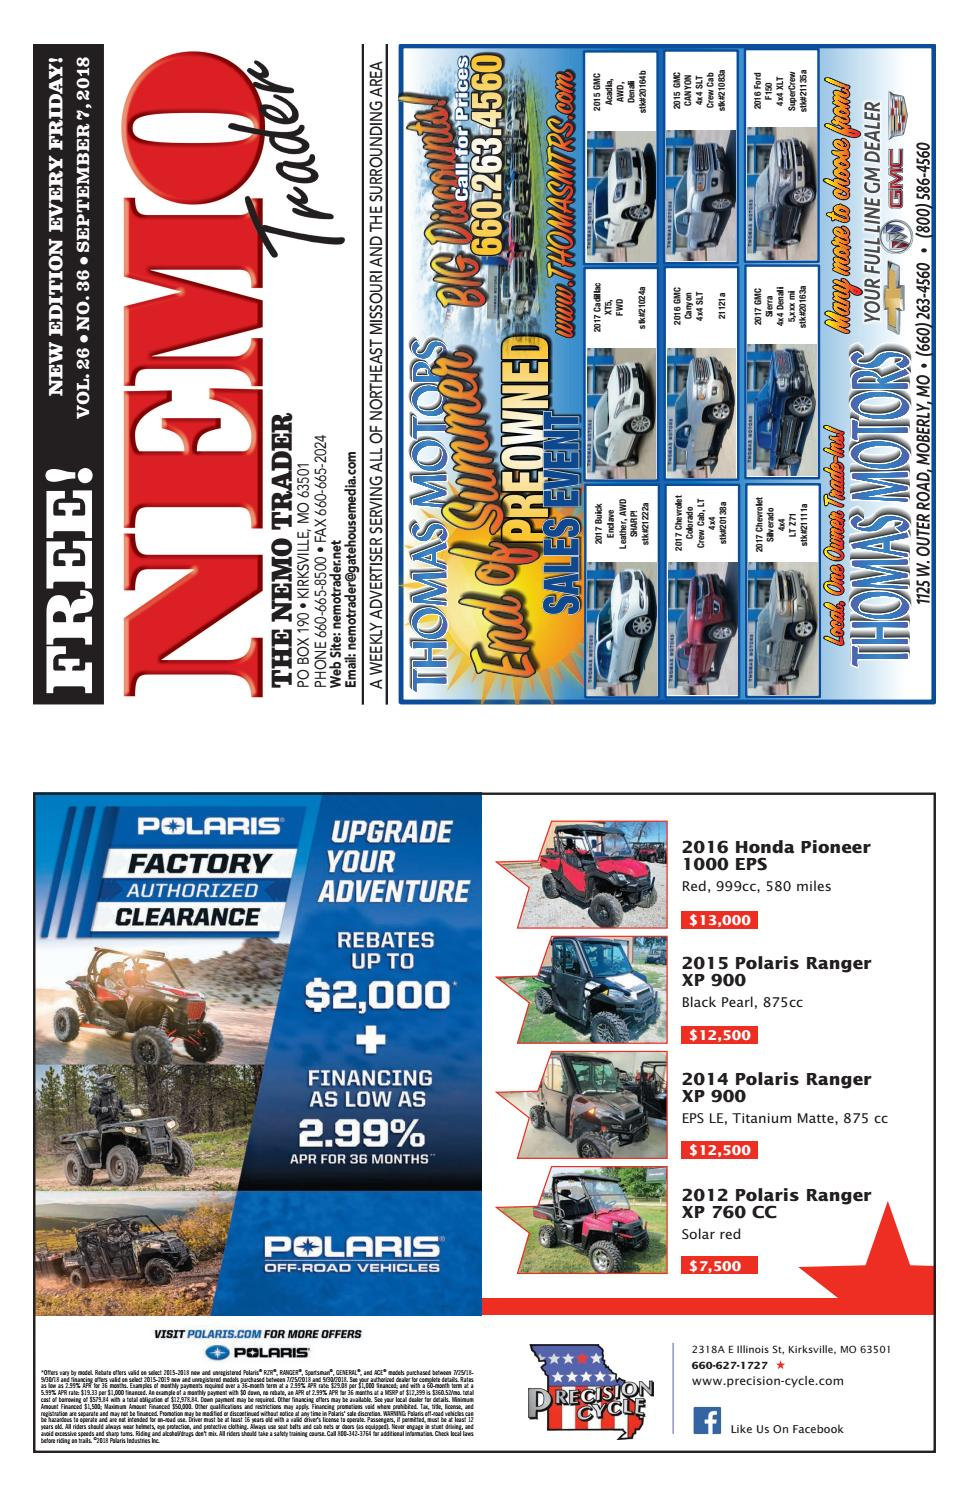 NEMO Trader September 7th, 2018 by NEMO Trader - issuu